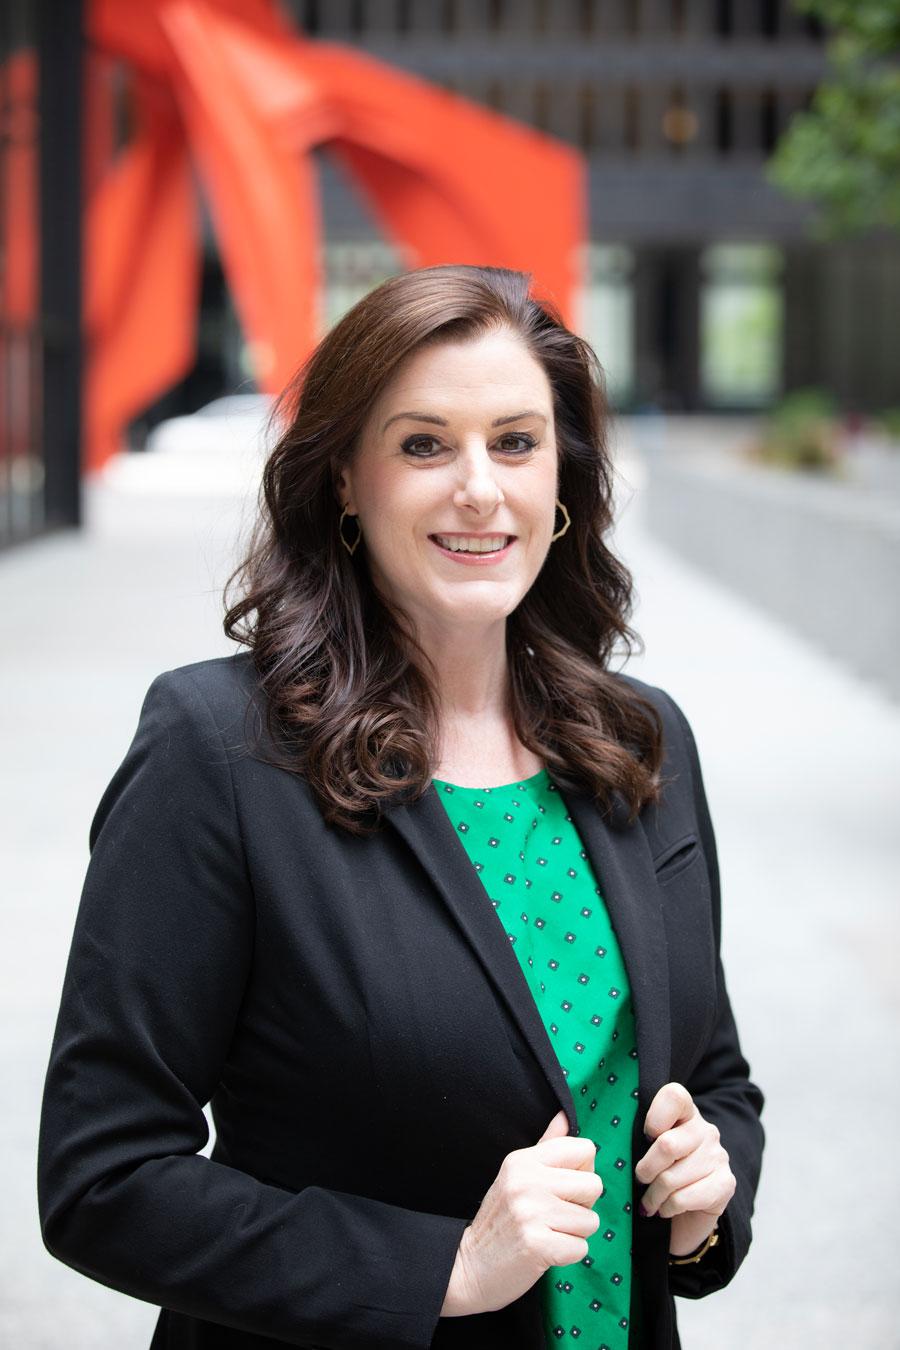 Staff Chelsea Fergen